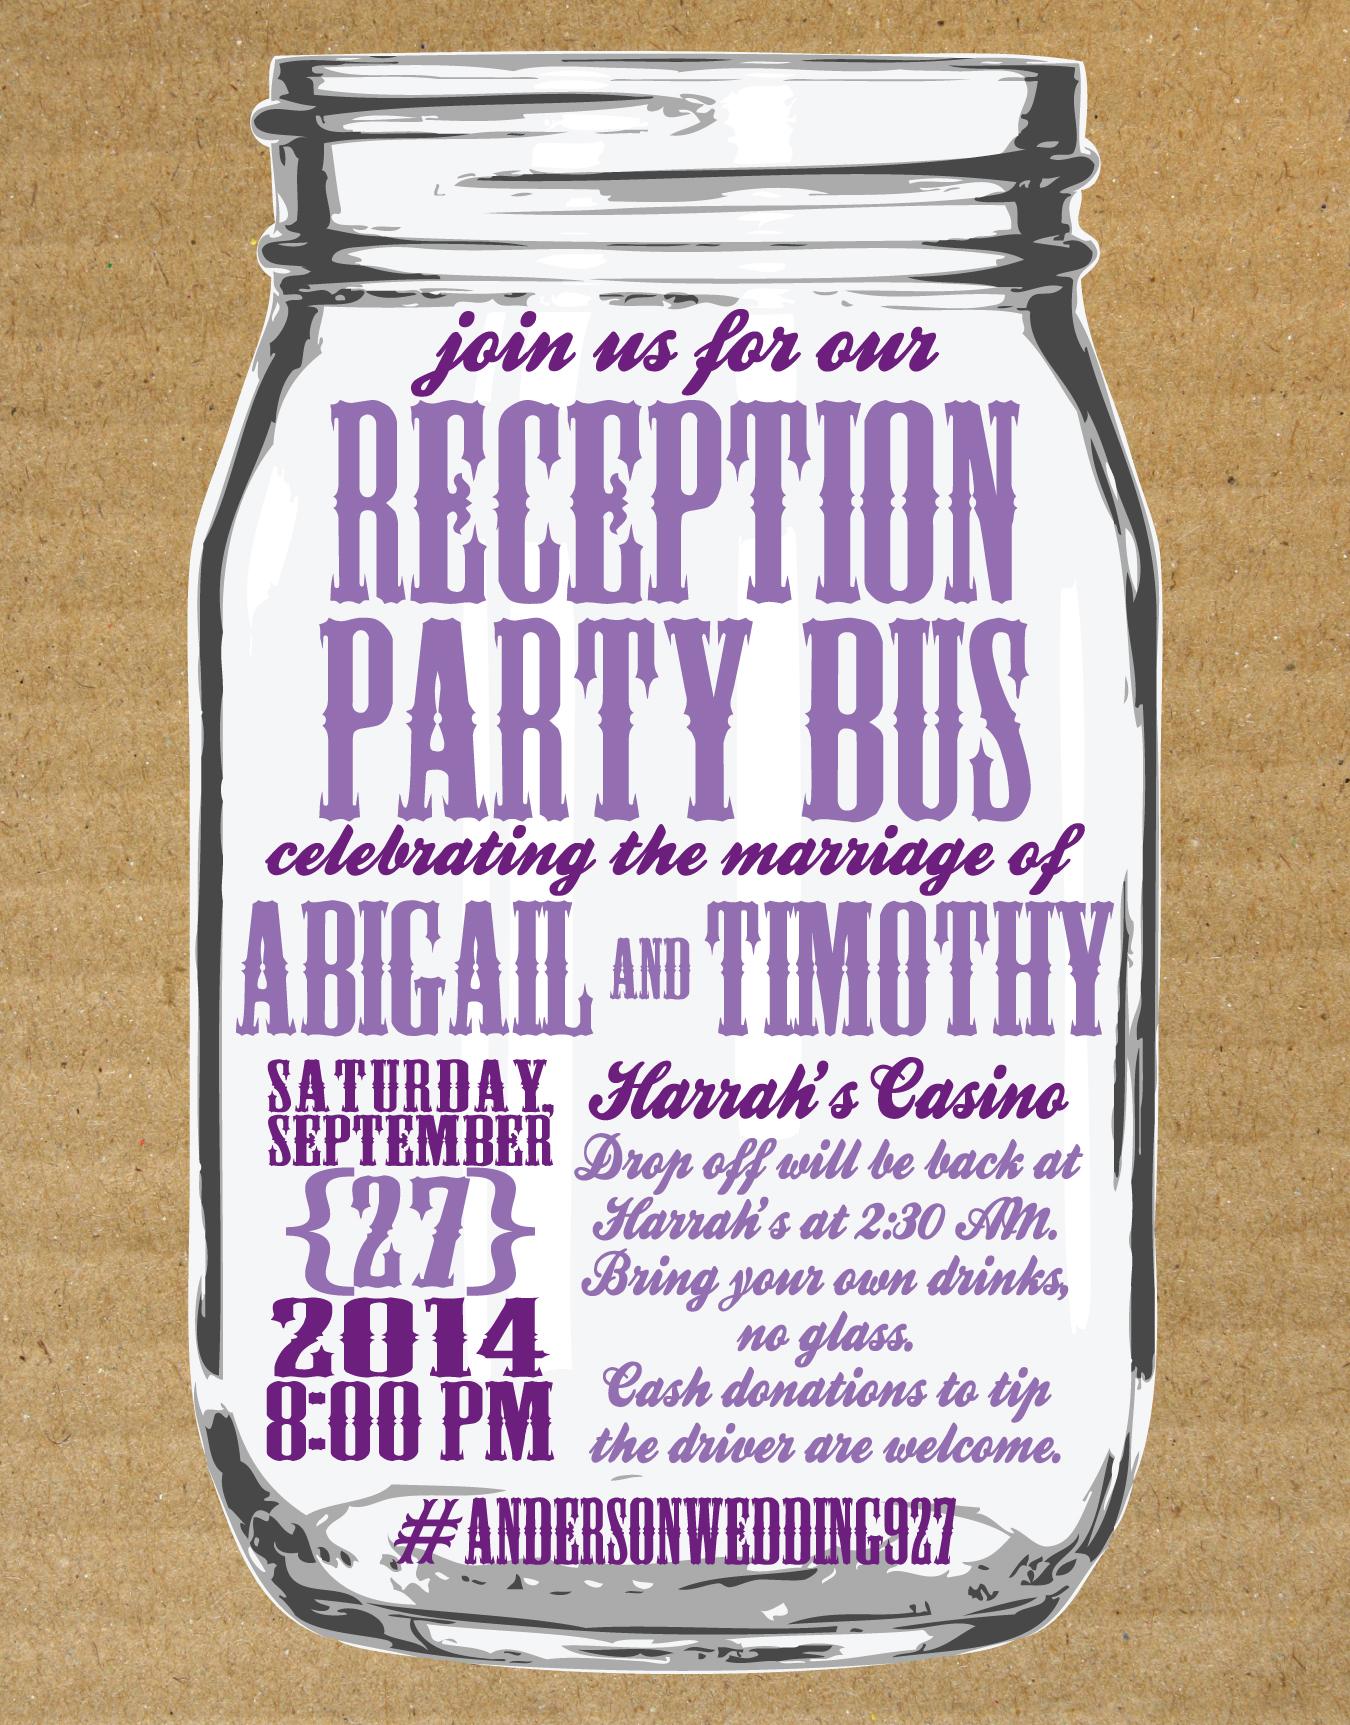 invitations wedding bridal shower bachelorette etc  jojo's, party invitations